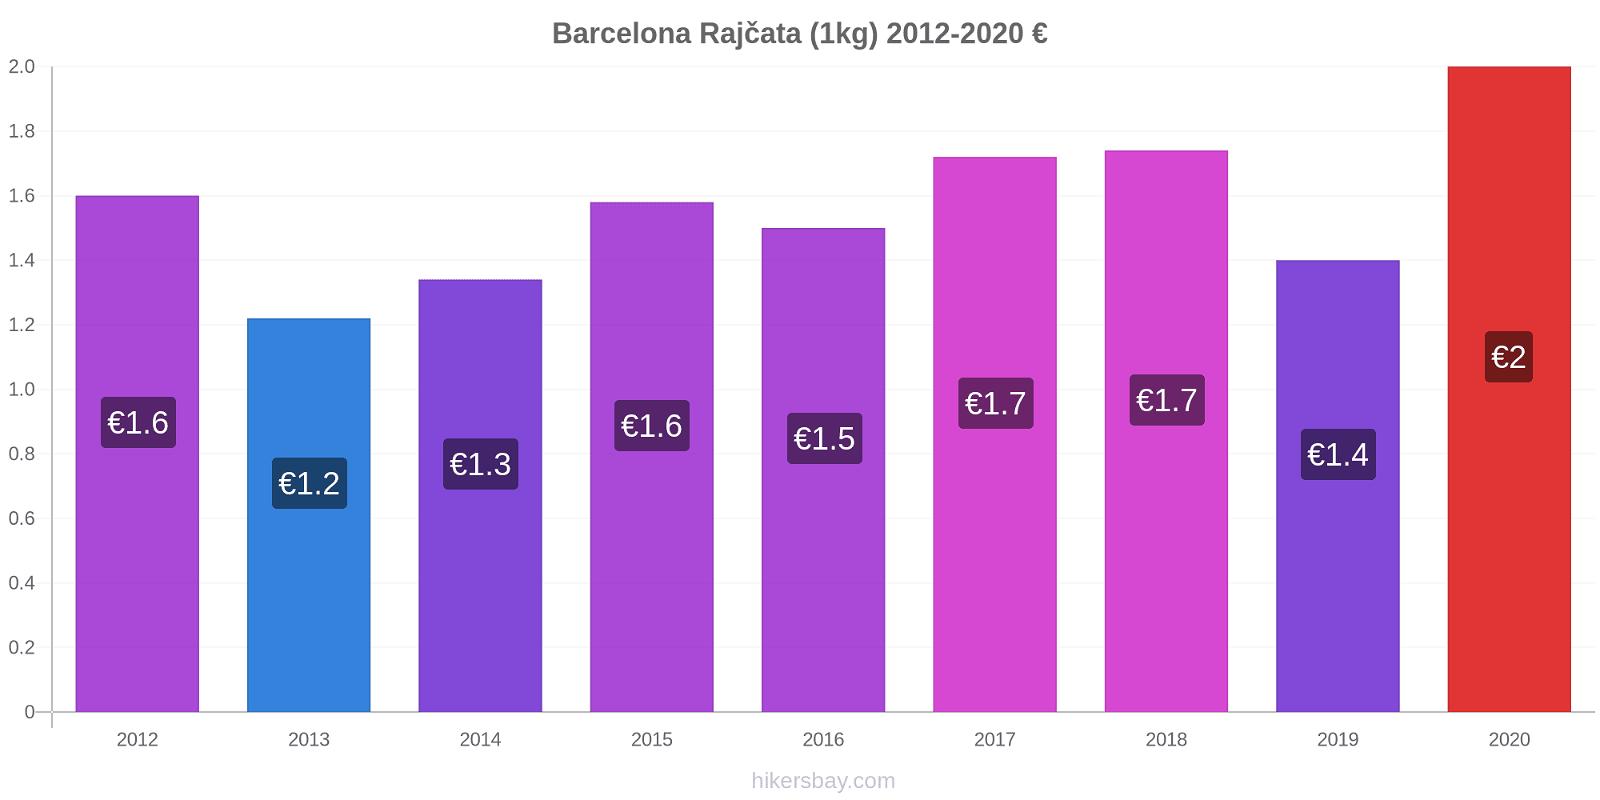 Barcelona změny cen Rajčata (1kg) hikersbay.com